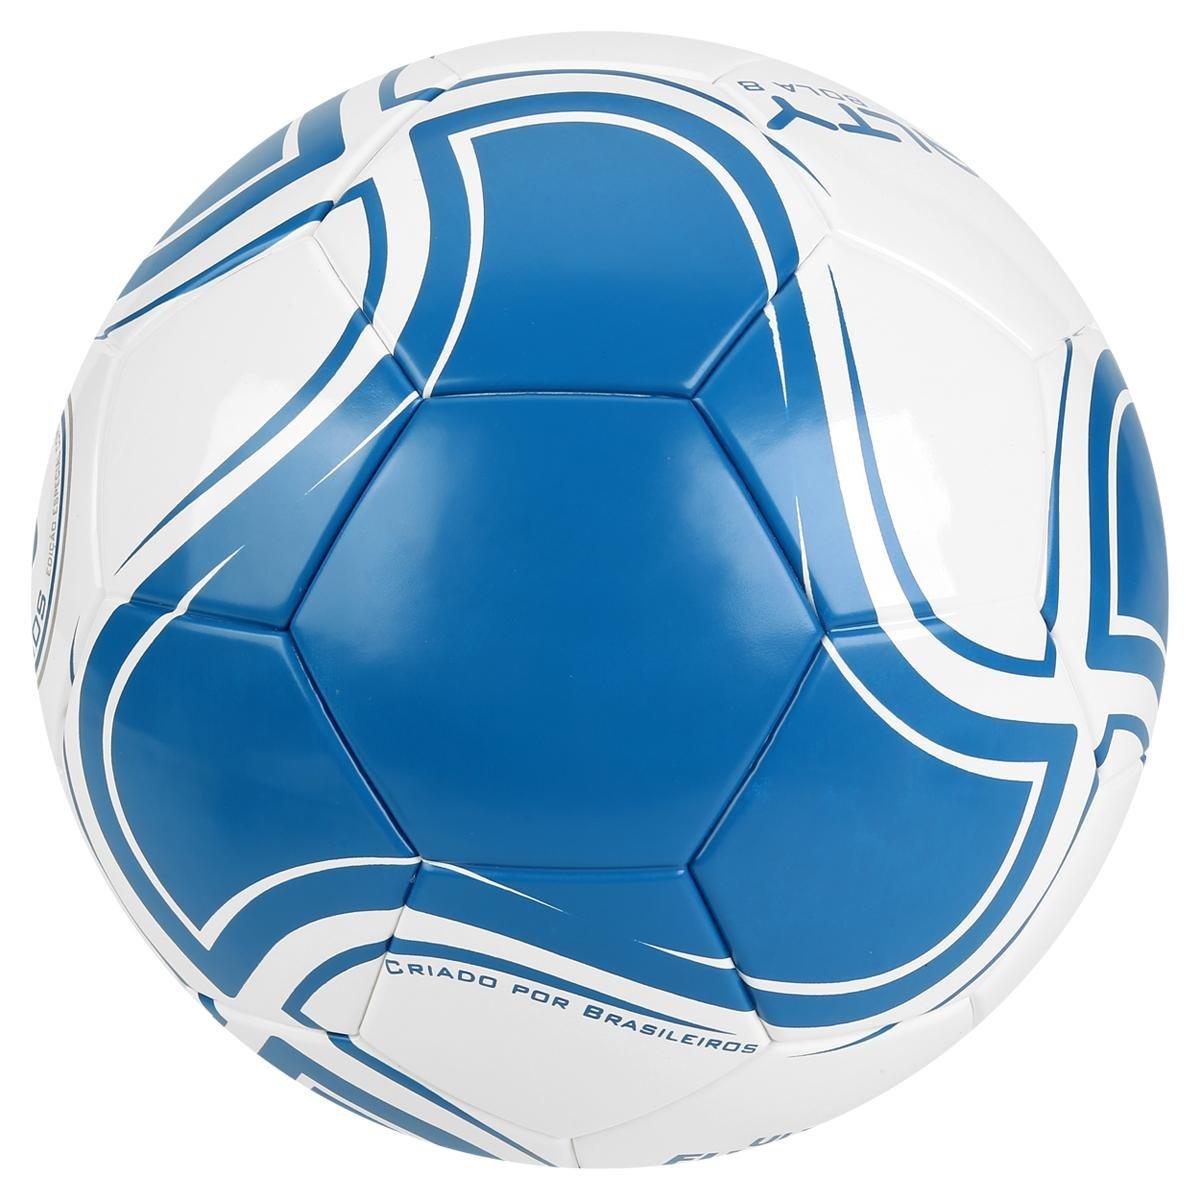 Bola Futebol Campo Penalty 8 S11 R3 Ultra Fusion 6 - Compre Agora ... 8db126ee4d5ed